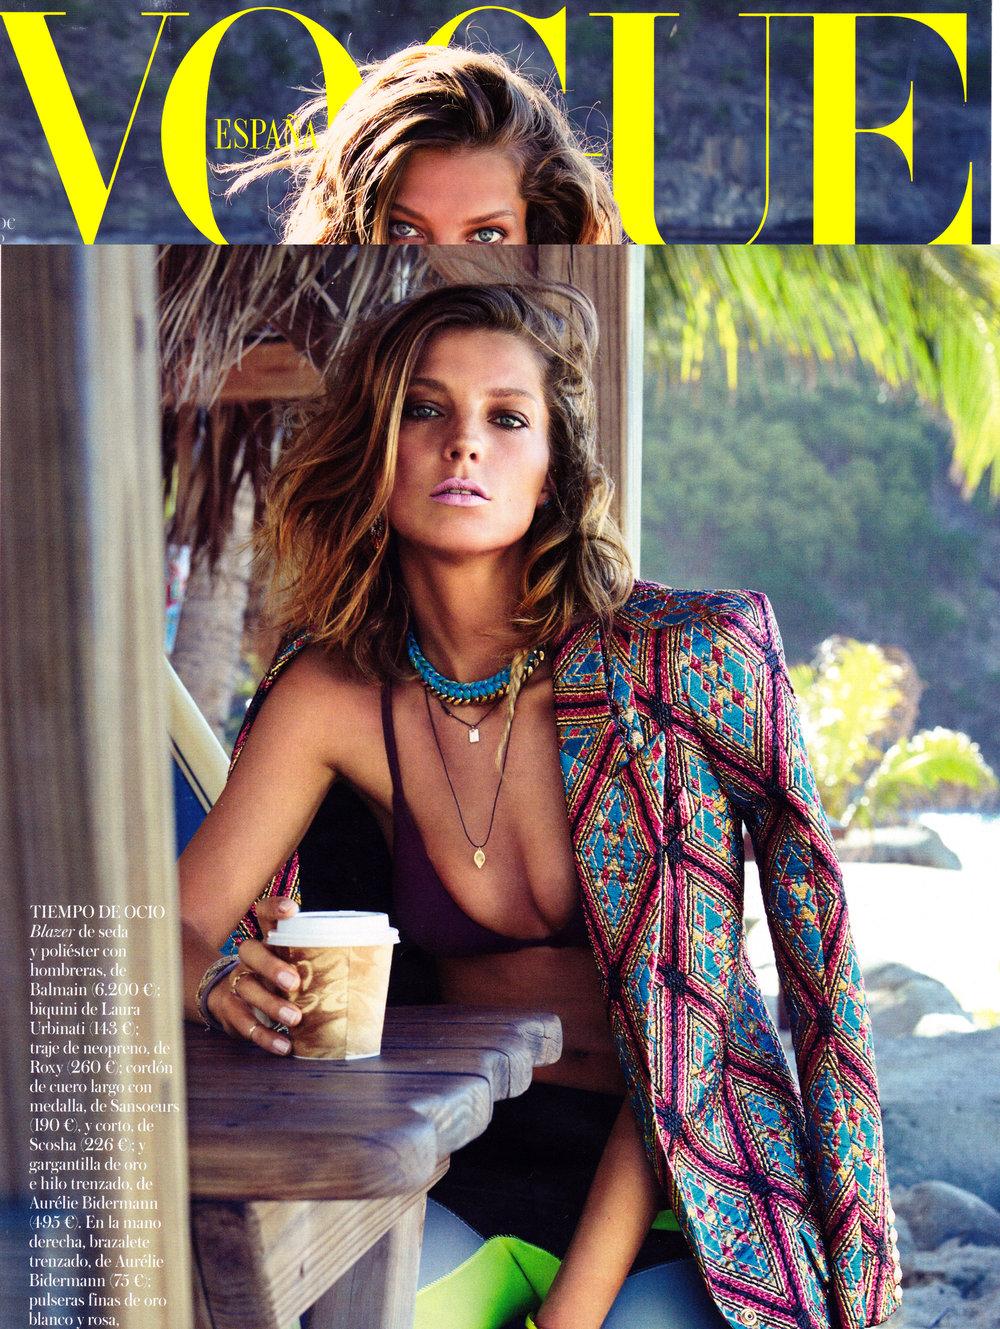 Daria Werbowy - Vogue Spain